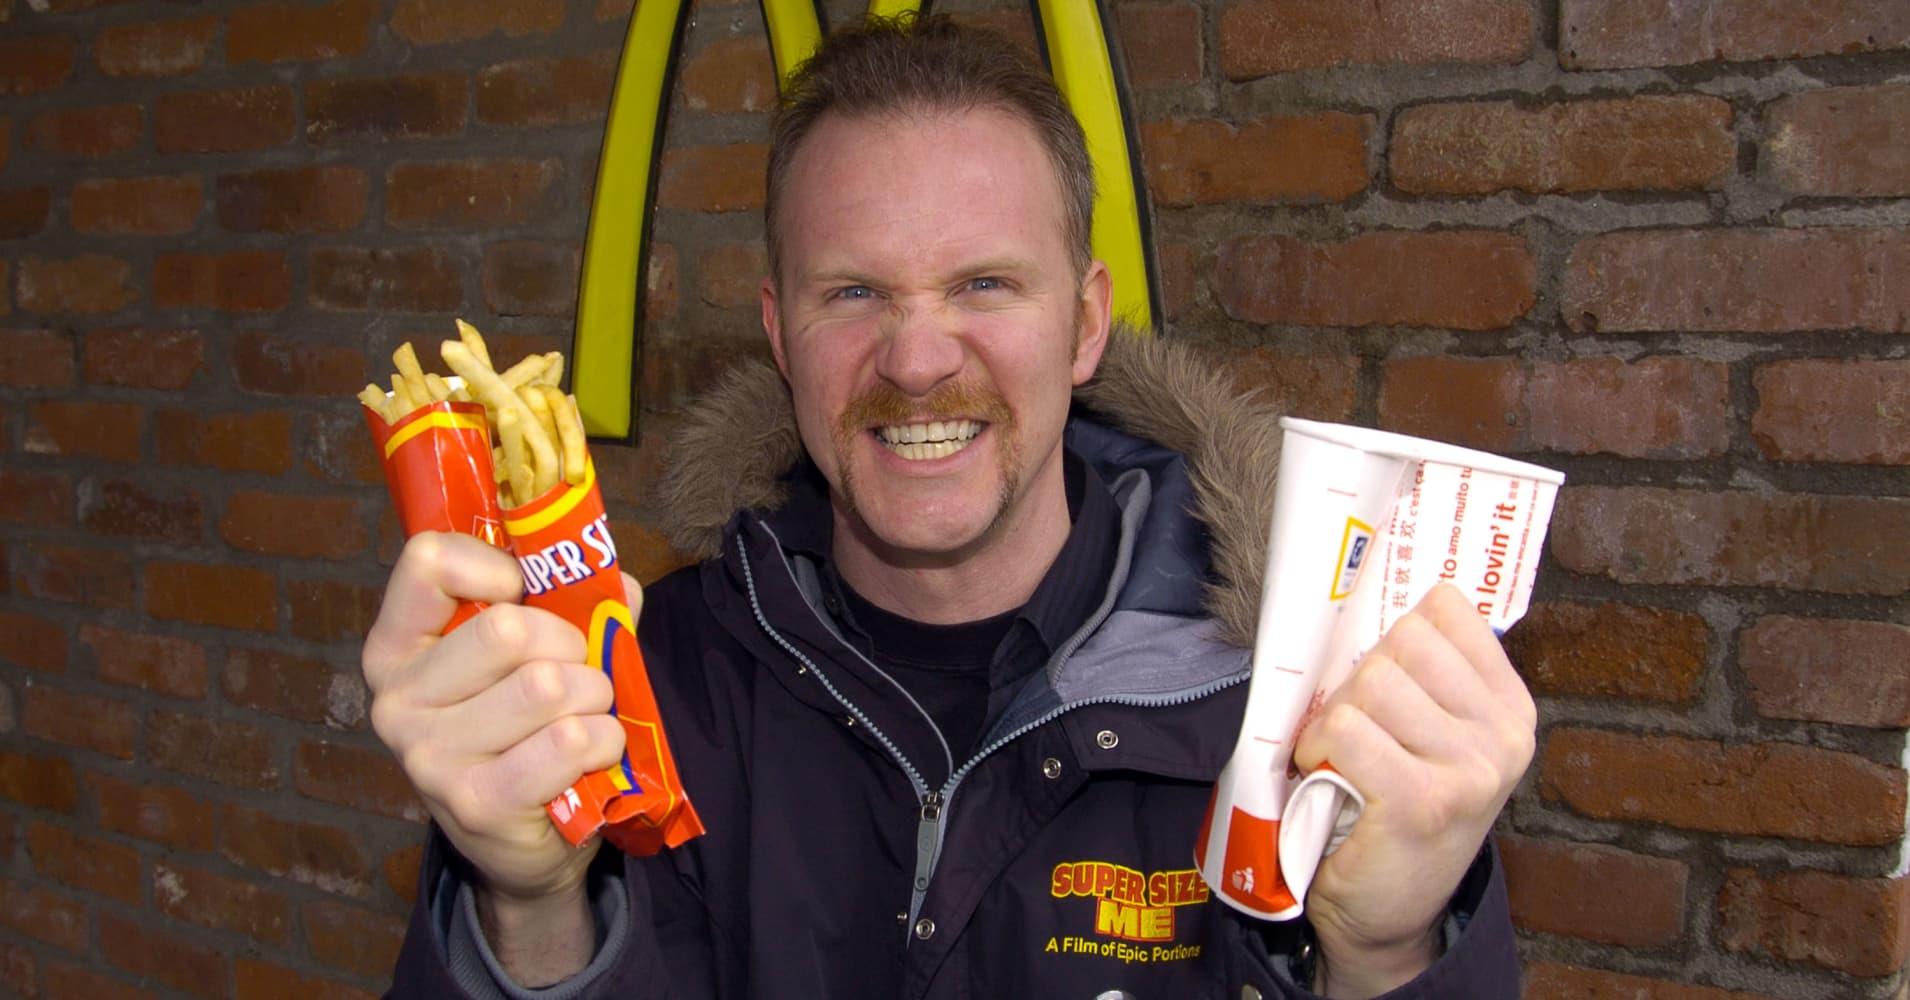 Super Size Me Star Morgan Spurlock Opening Fast Food